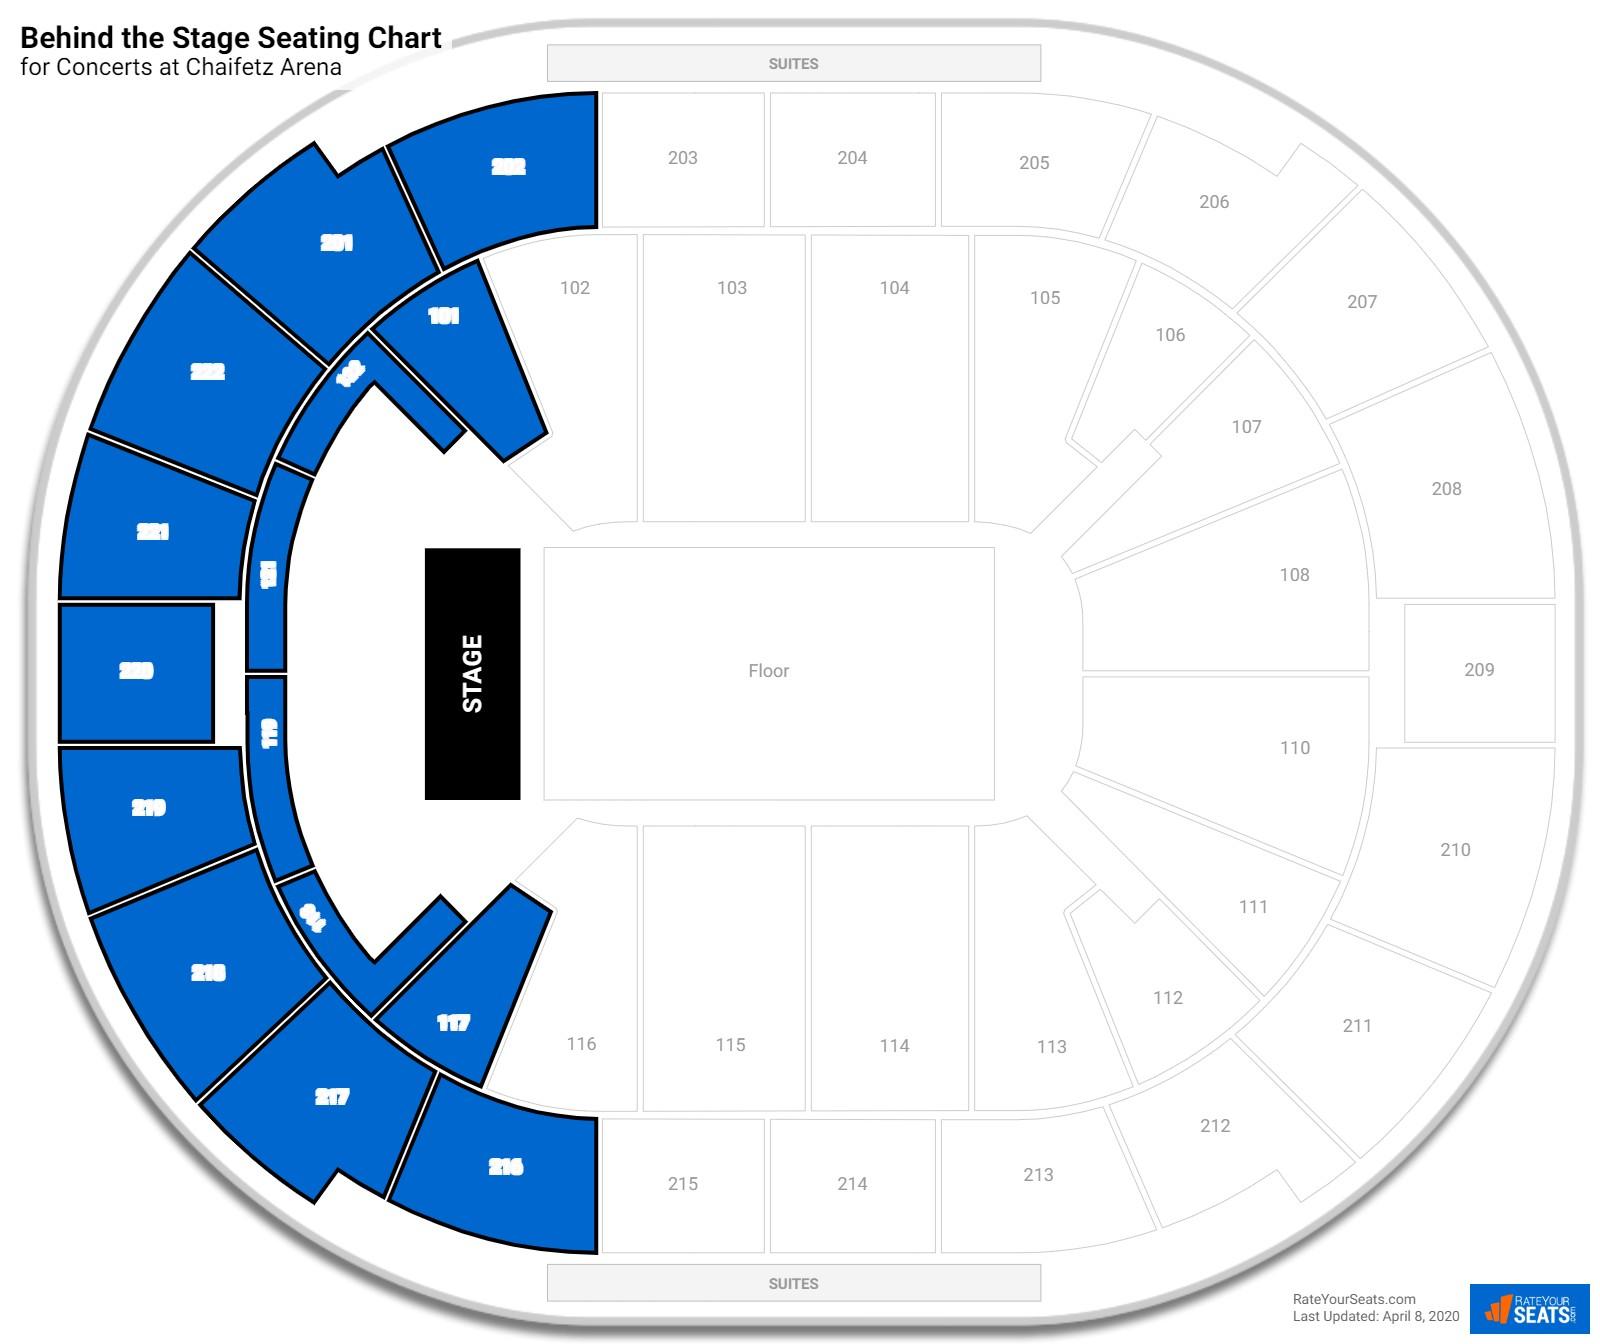 Chaifetz arena concert seating guide rateyourseats com